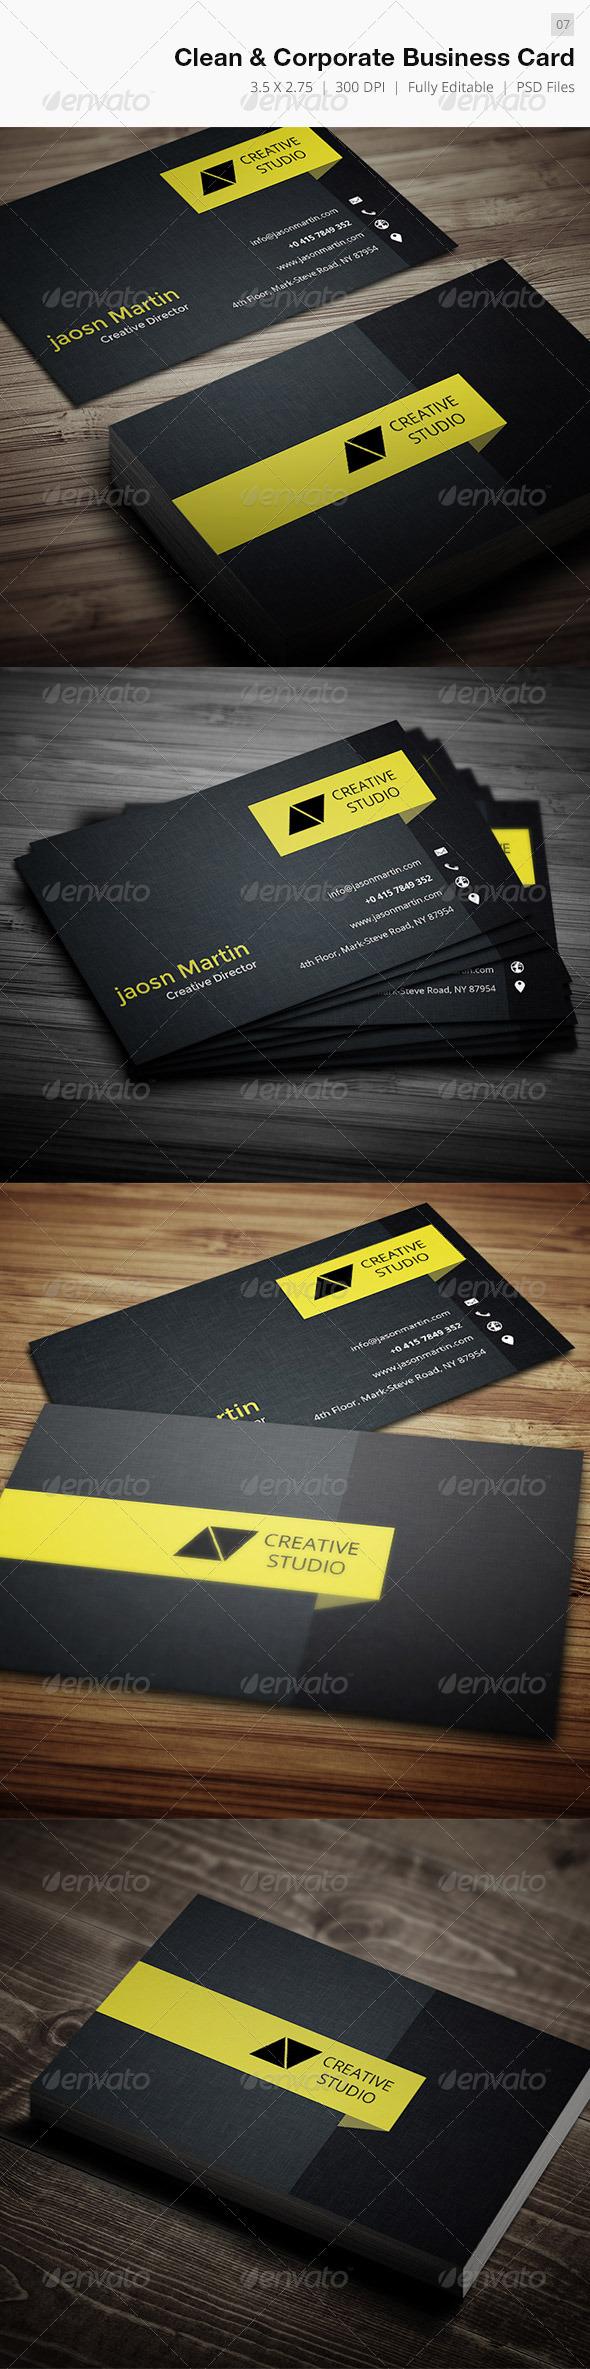 Creative Corporate Business Card - 07 - Creative Business Cards